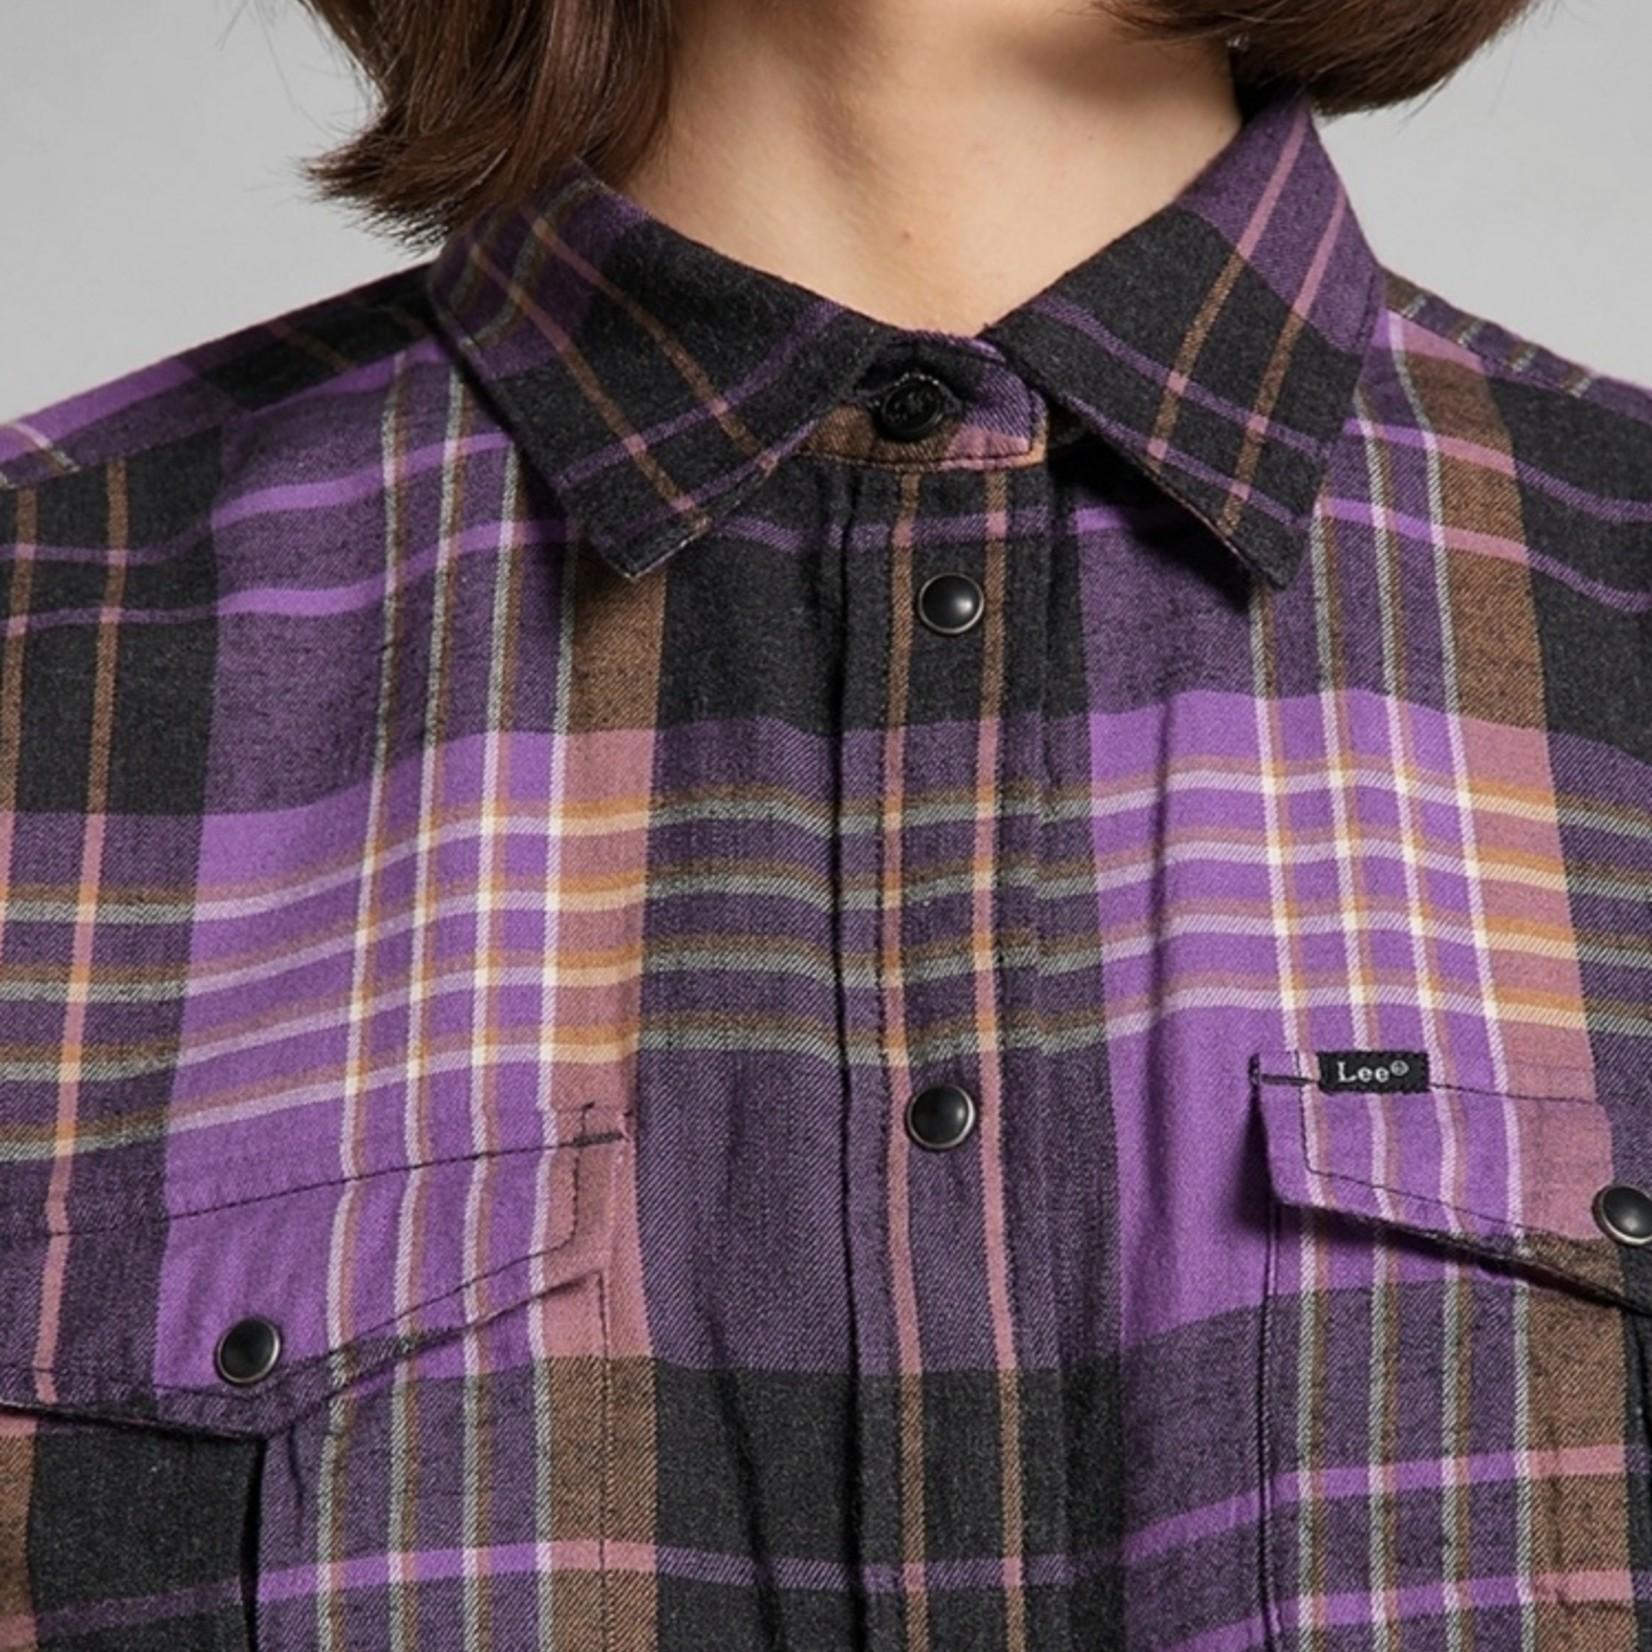 LEE REGULAR WESTERN SHIRT, blouse